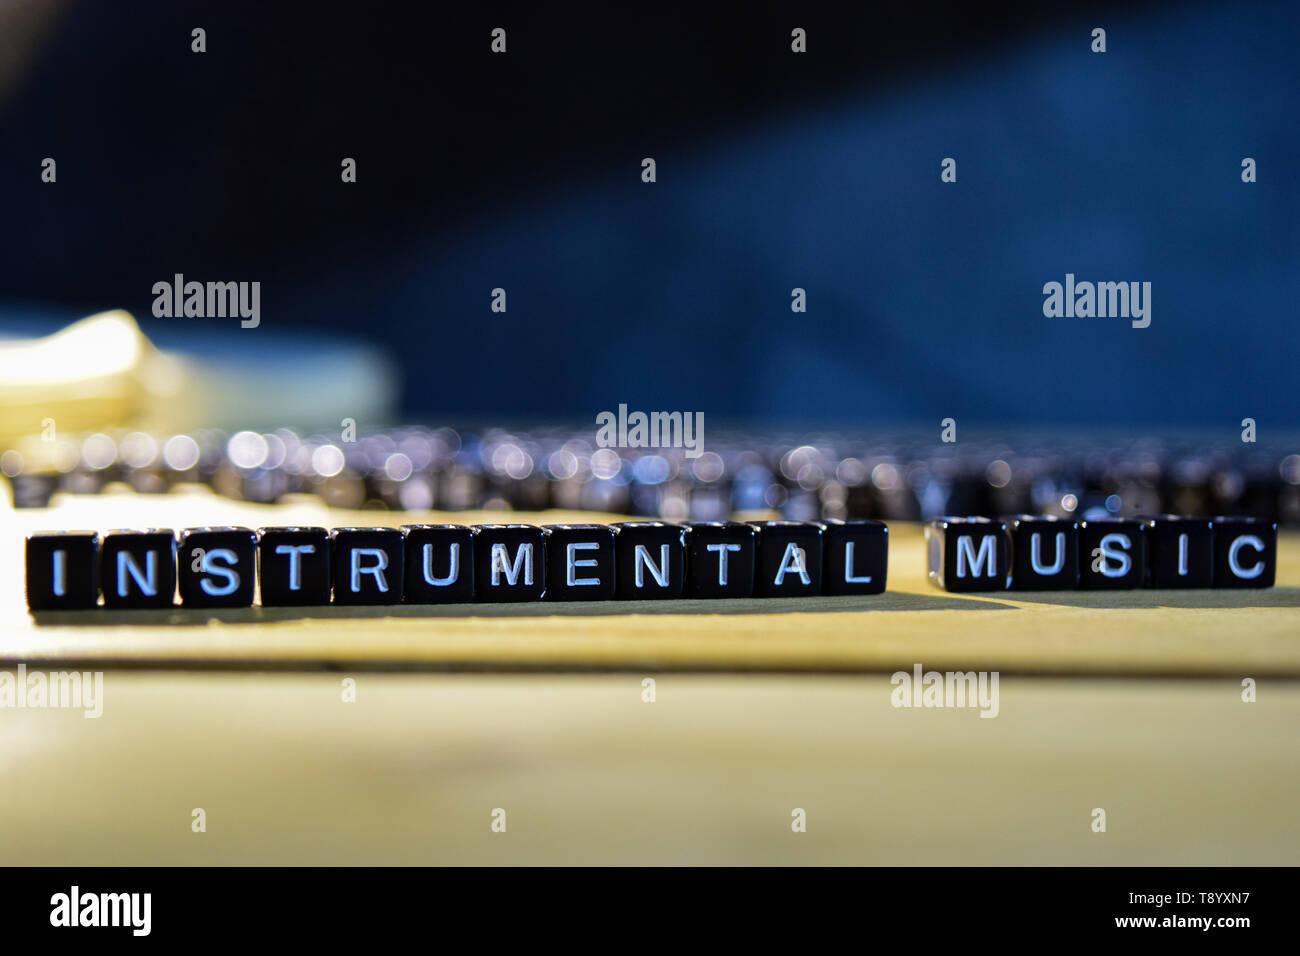 Instrumental Music Stock Photos & Instrumental Music Stock